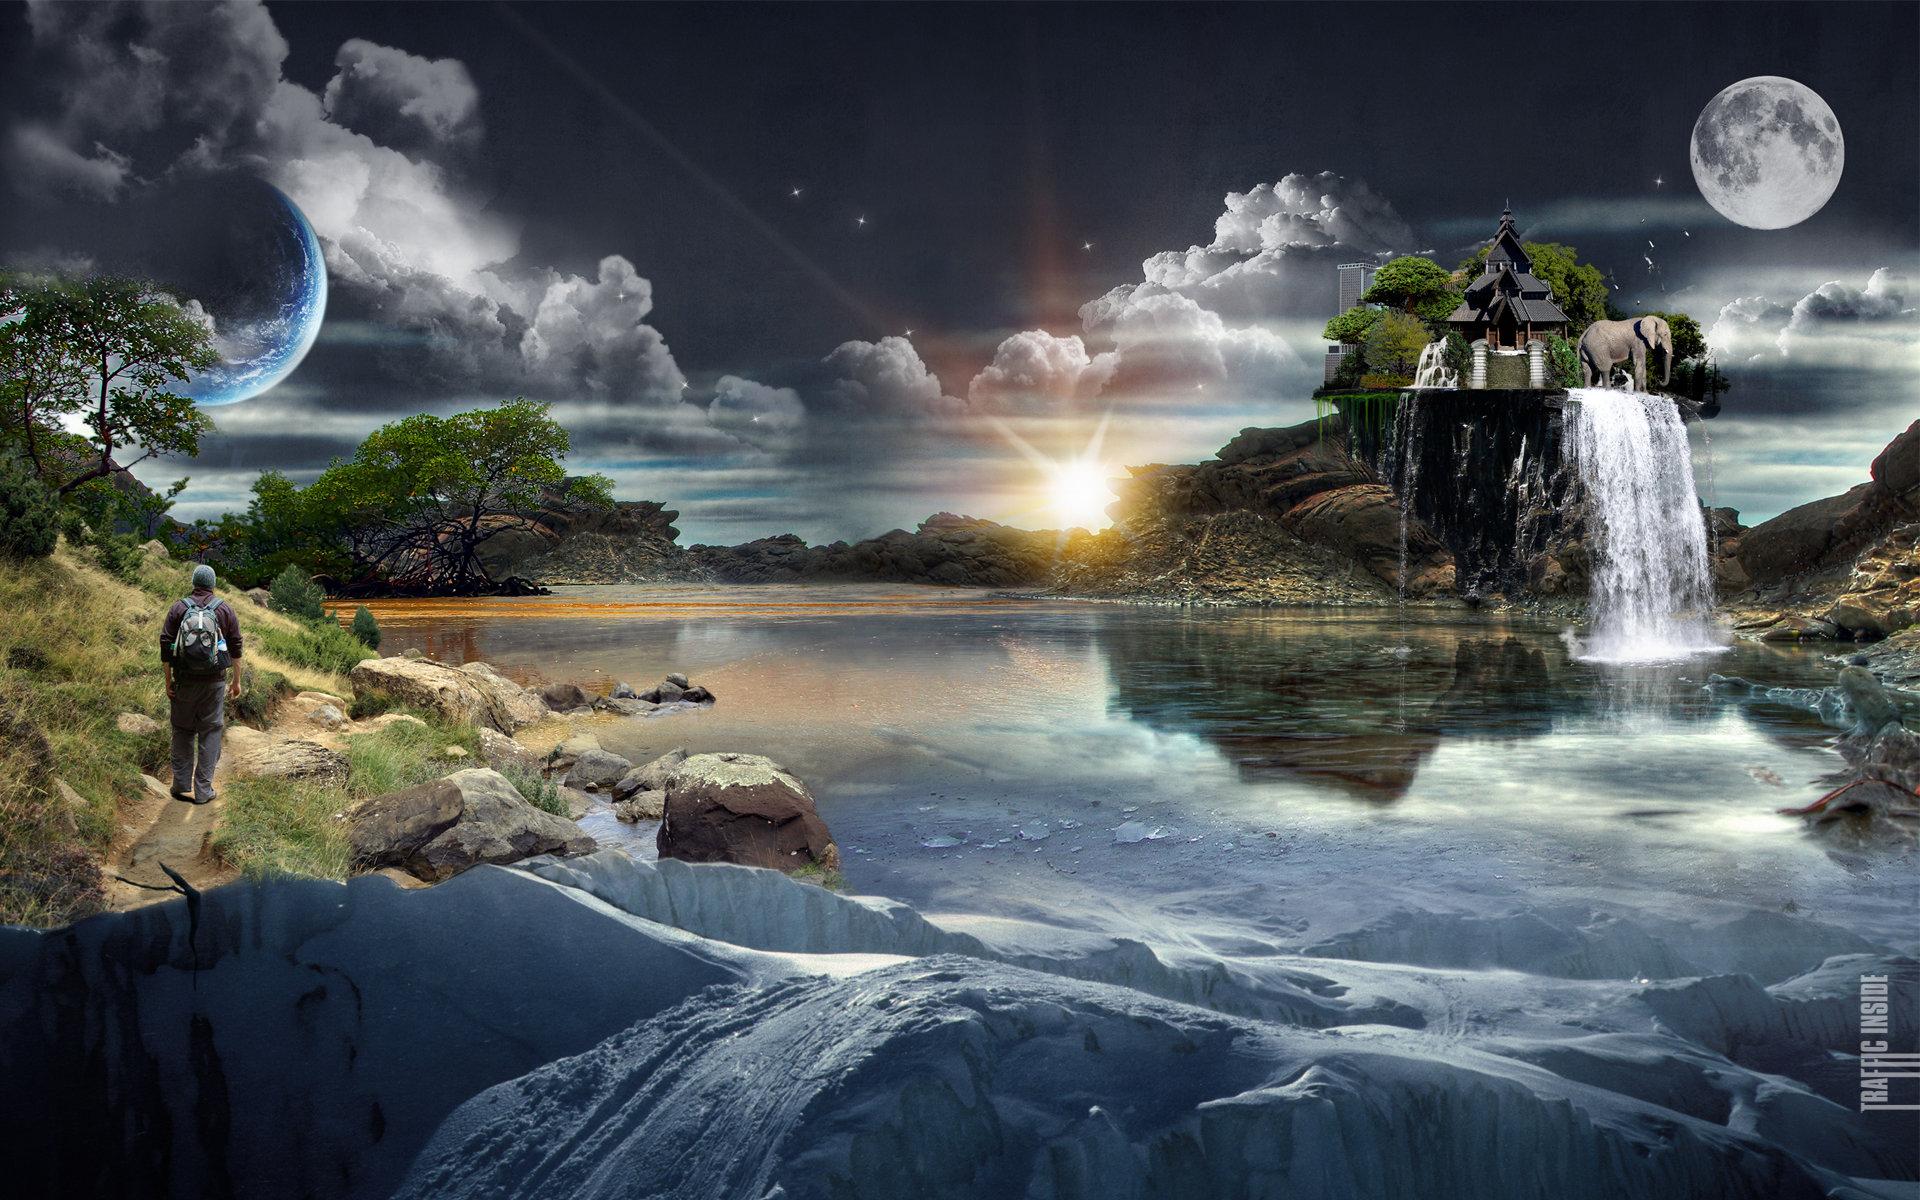 Surreal Wallpapers Hd For Desktop Backgrounds